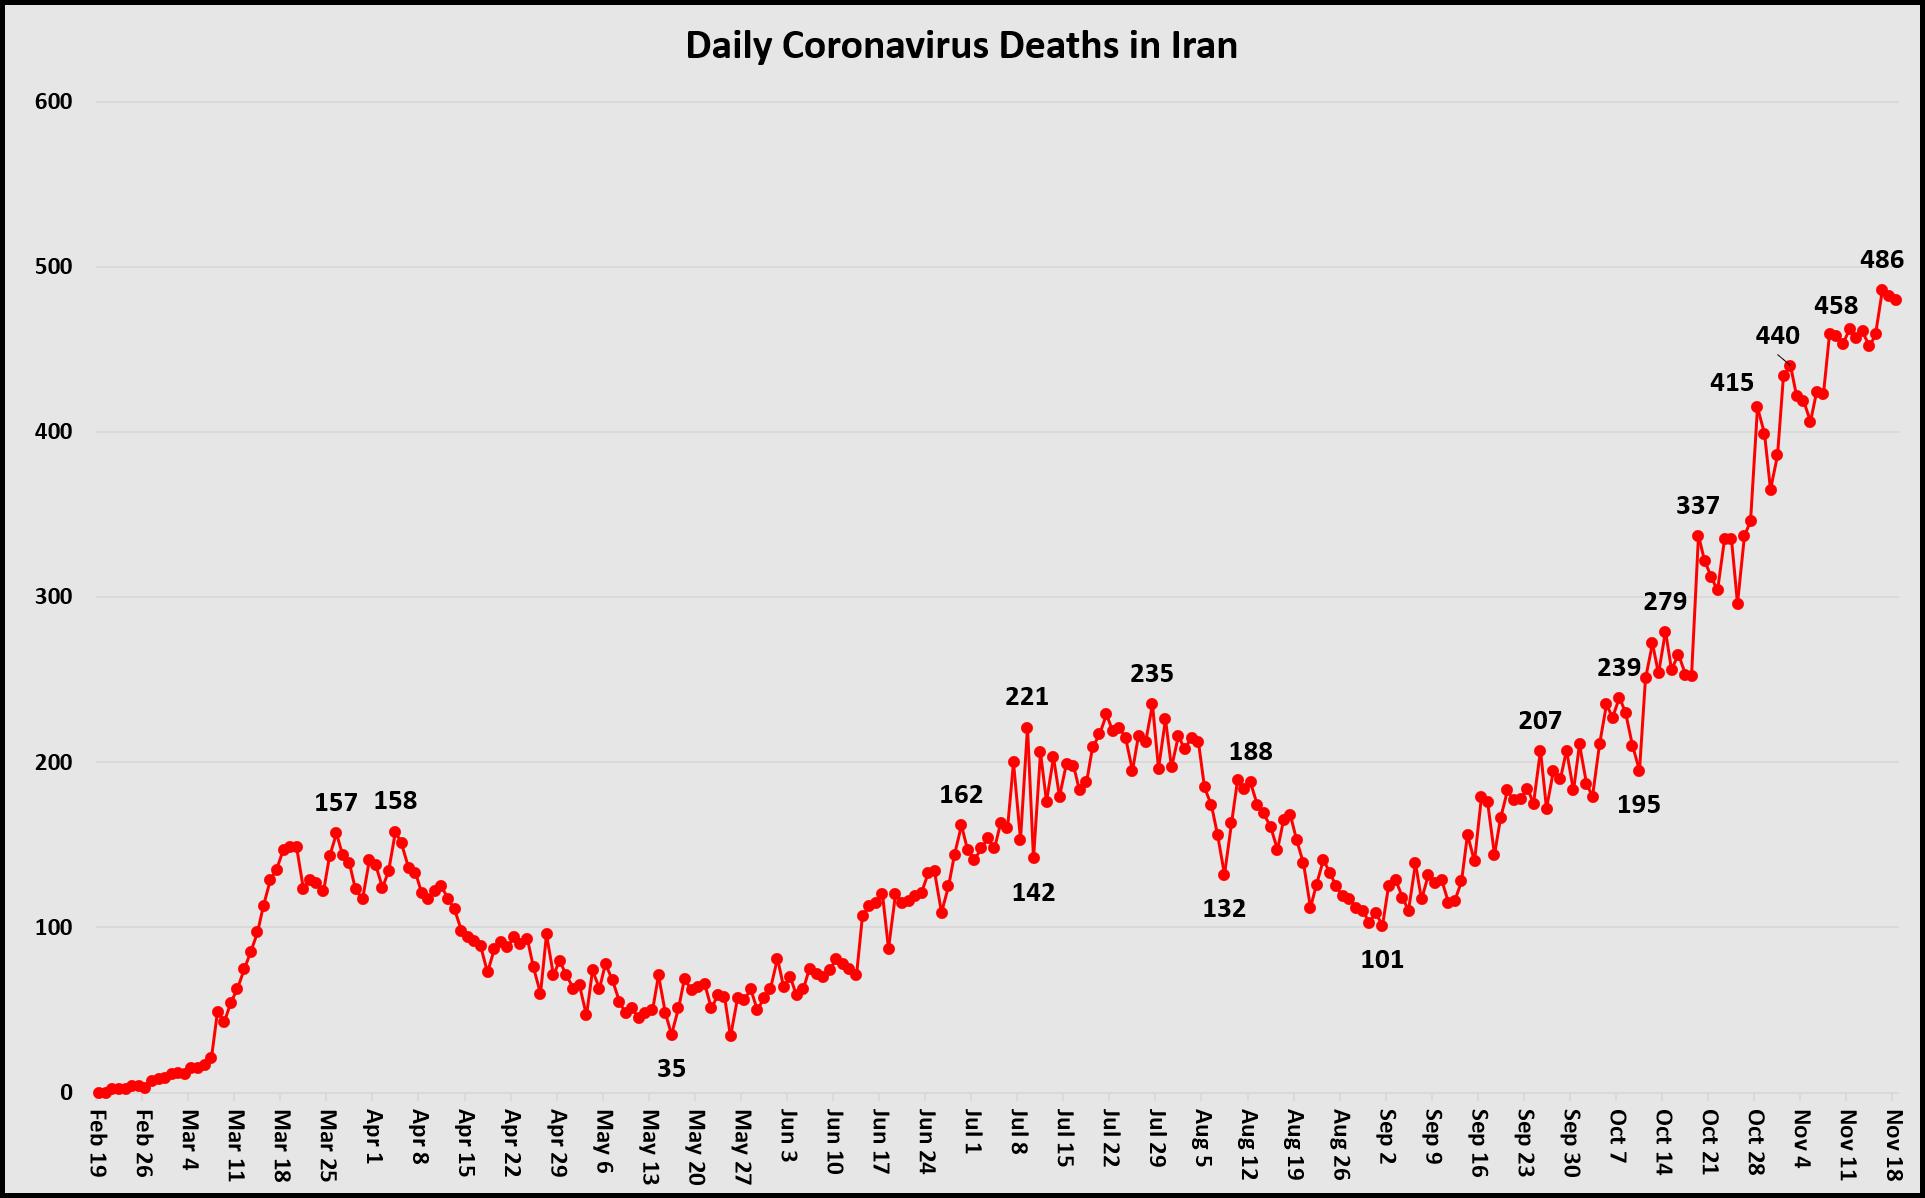 Daily Deaths